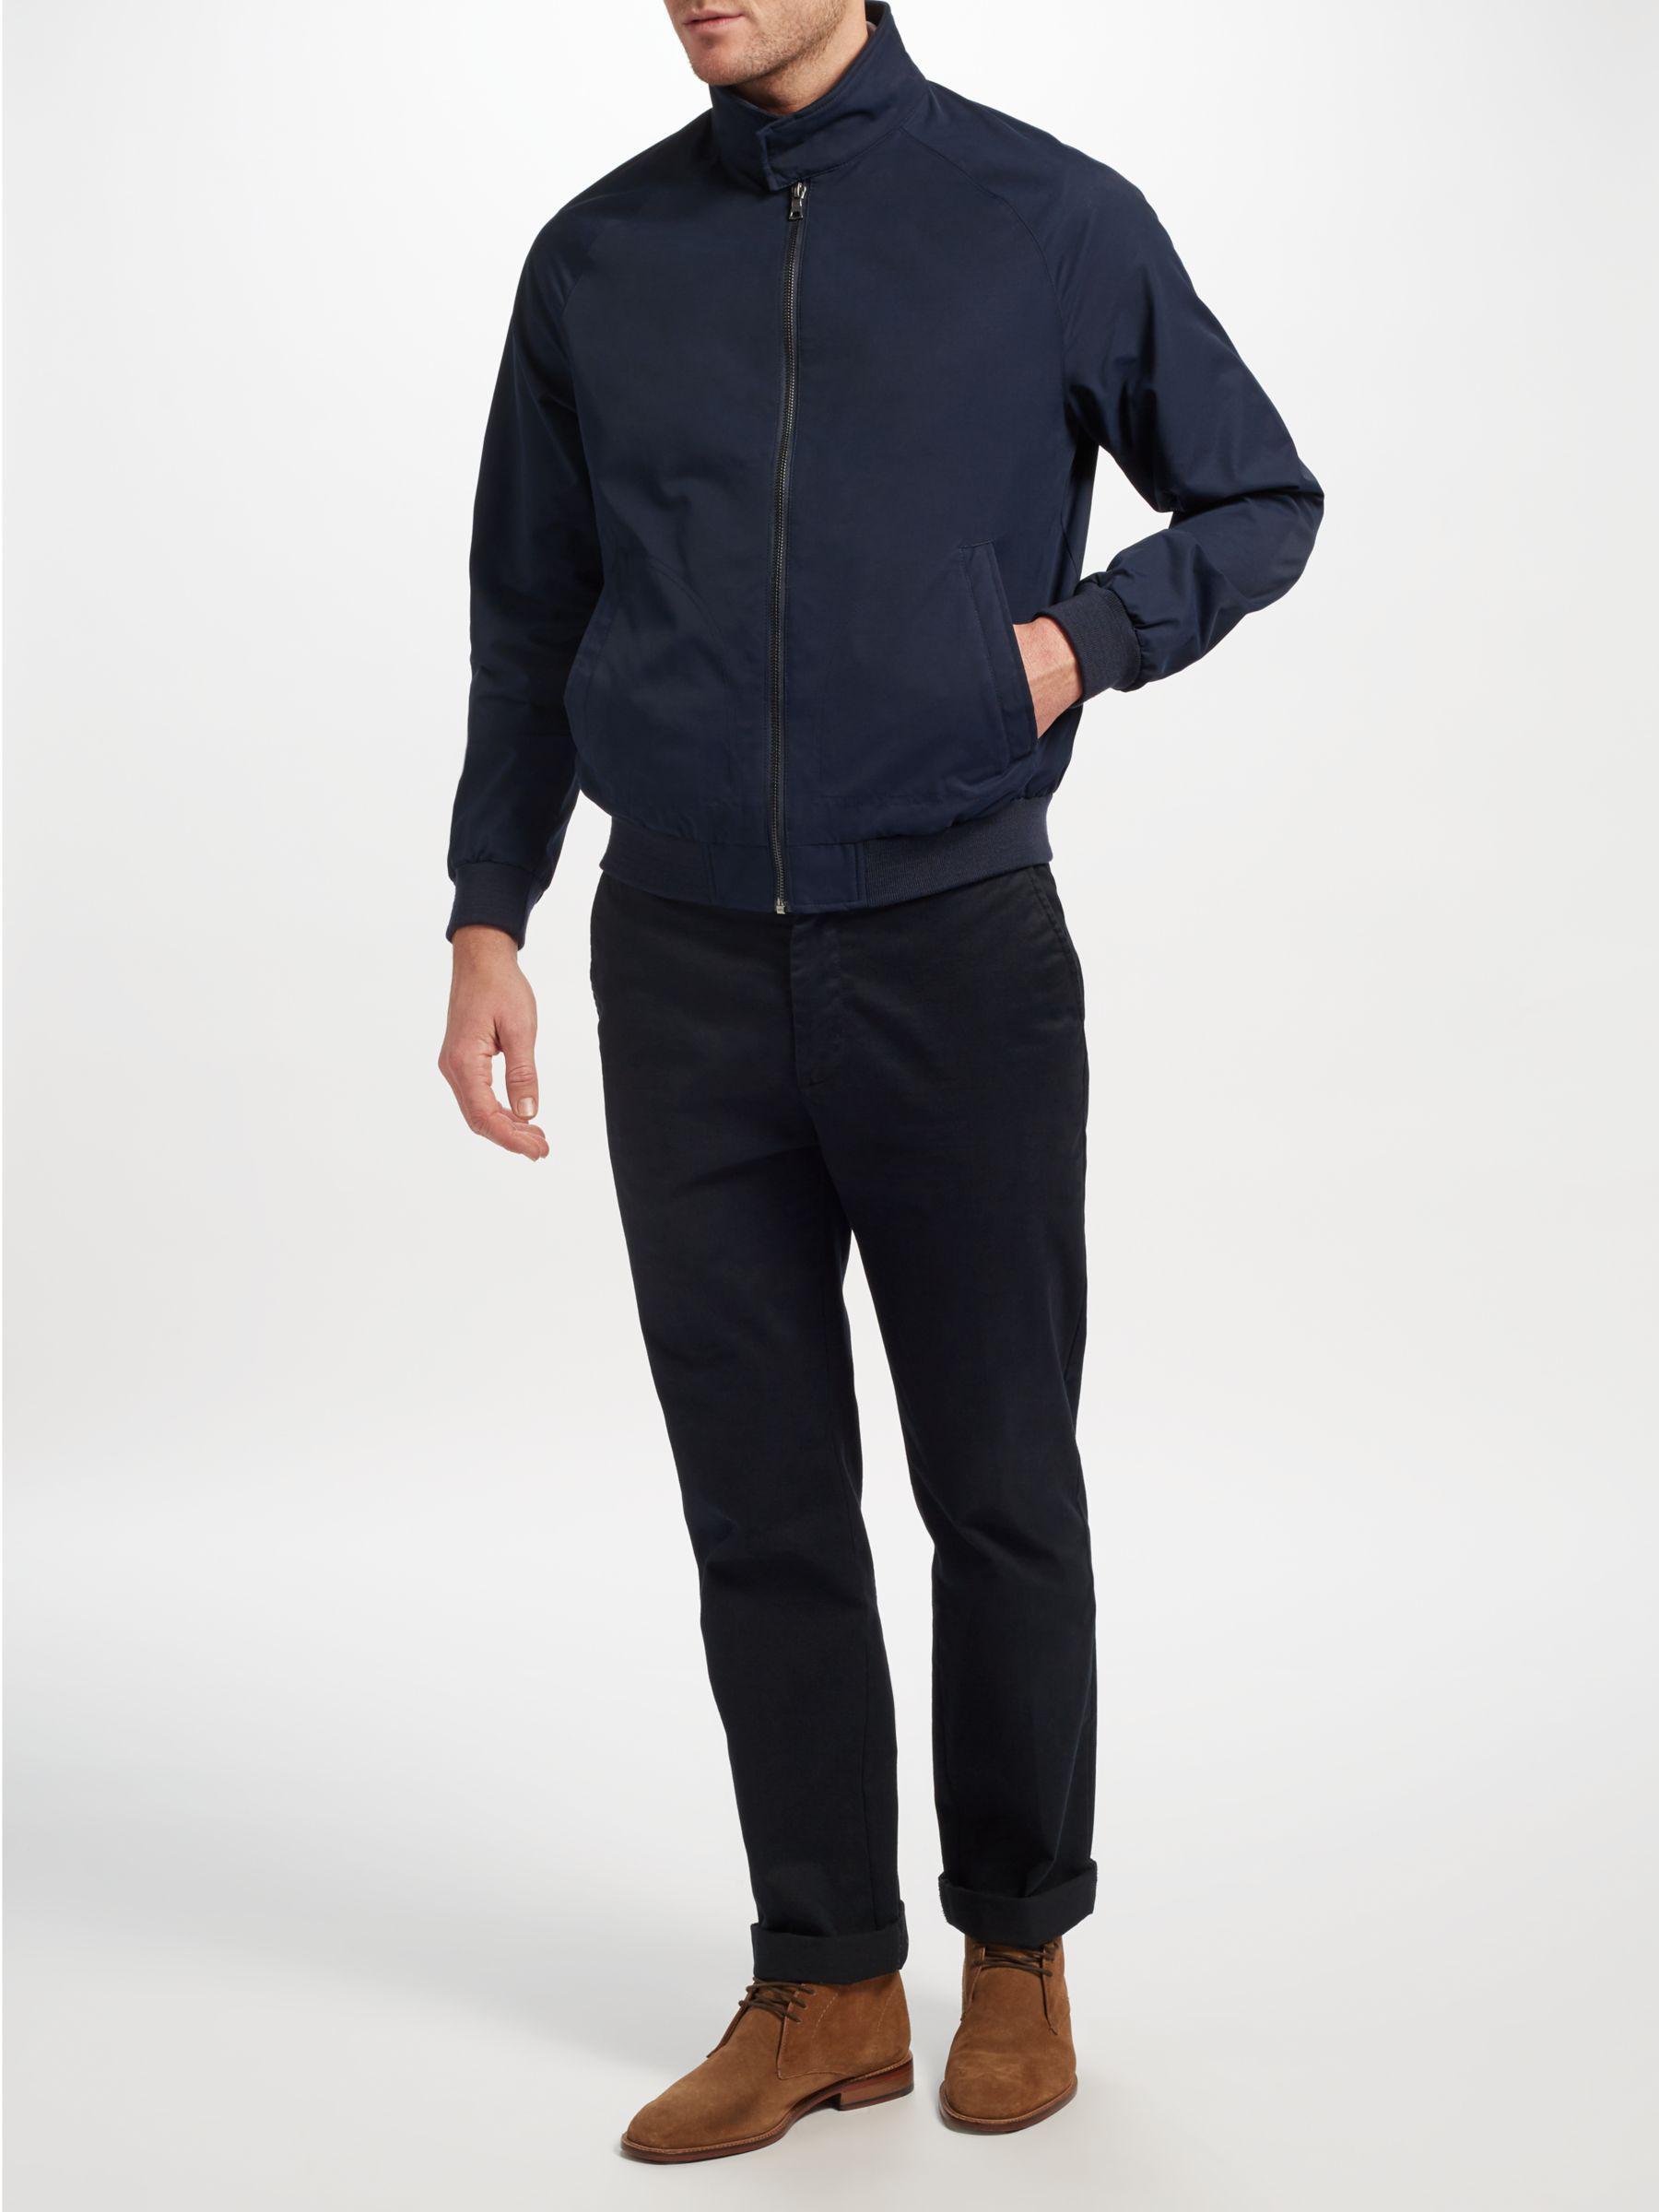 John Lewis Cotton Shower Resistant Harrington Jacket in Navy (Blue) for Men